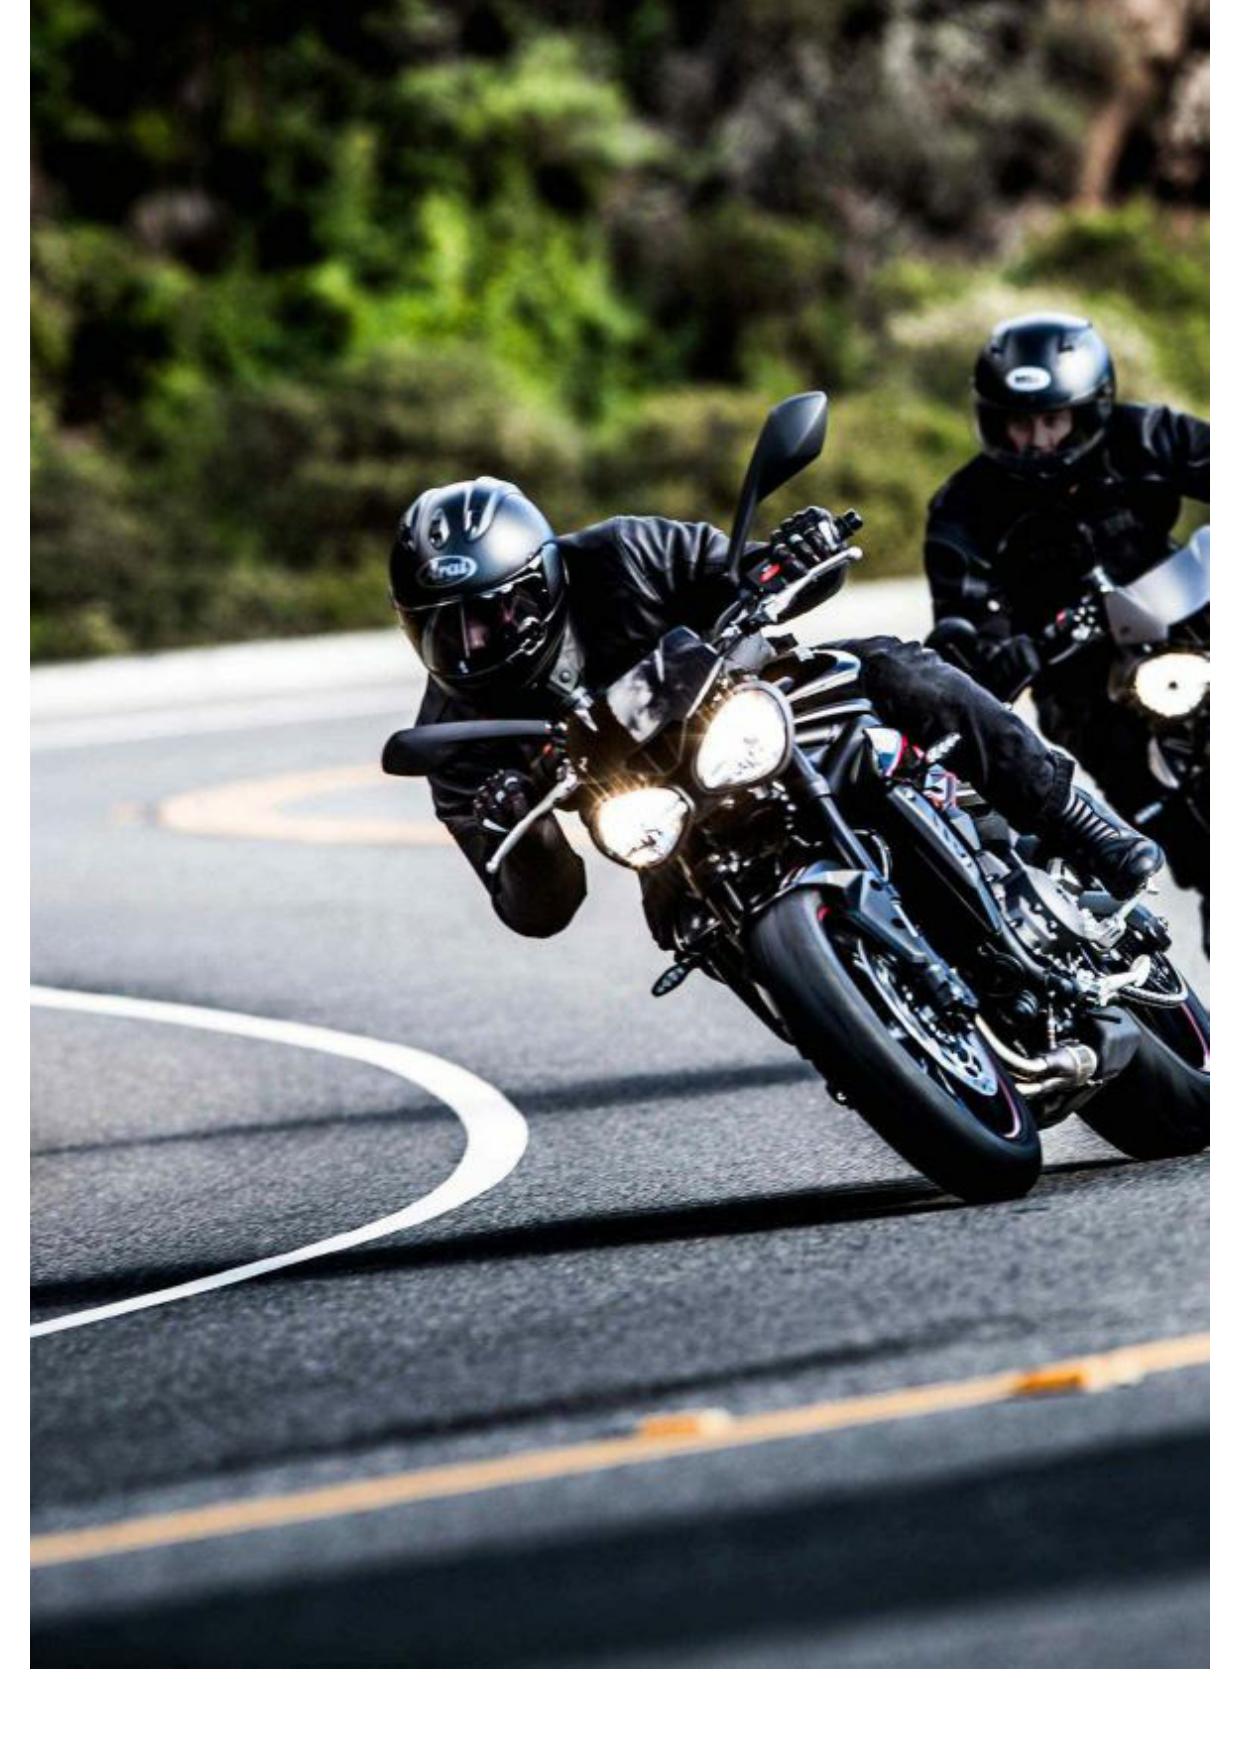 TRIUMPH MOTORCYCLE PADDOCK STAND BOBBINS GREY A9640159